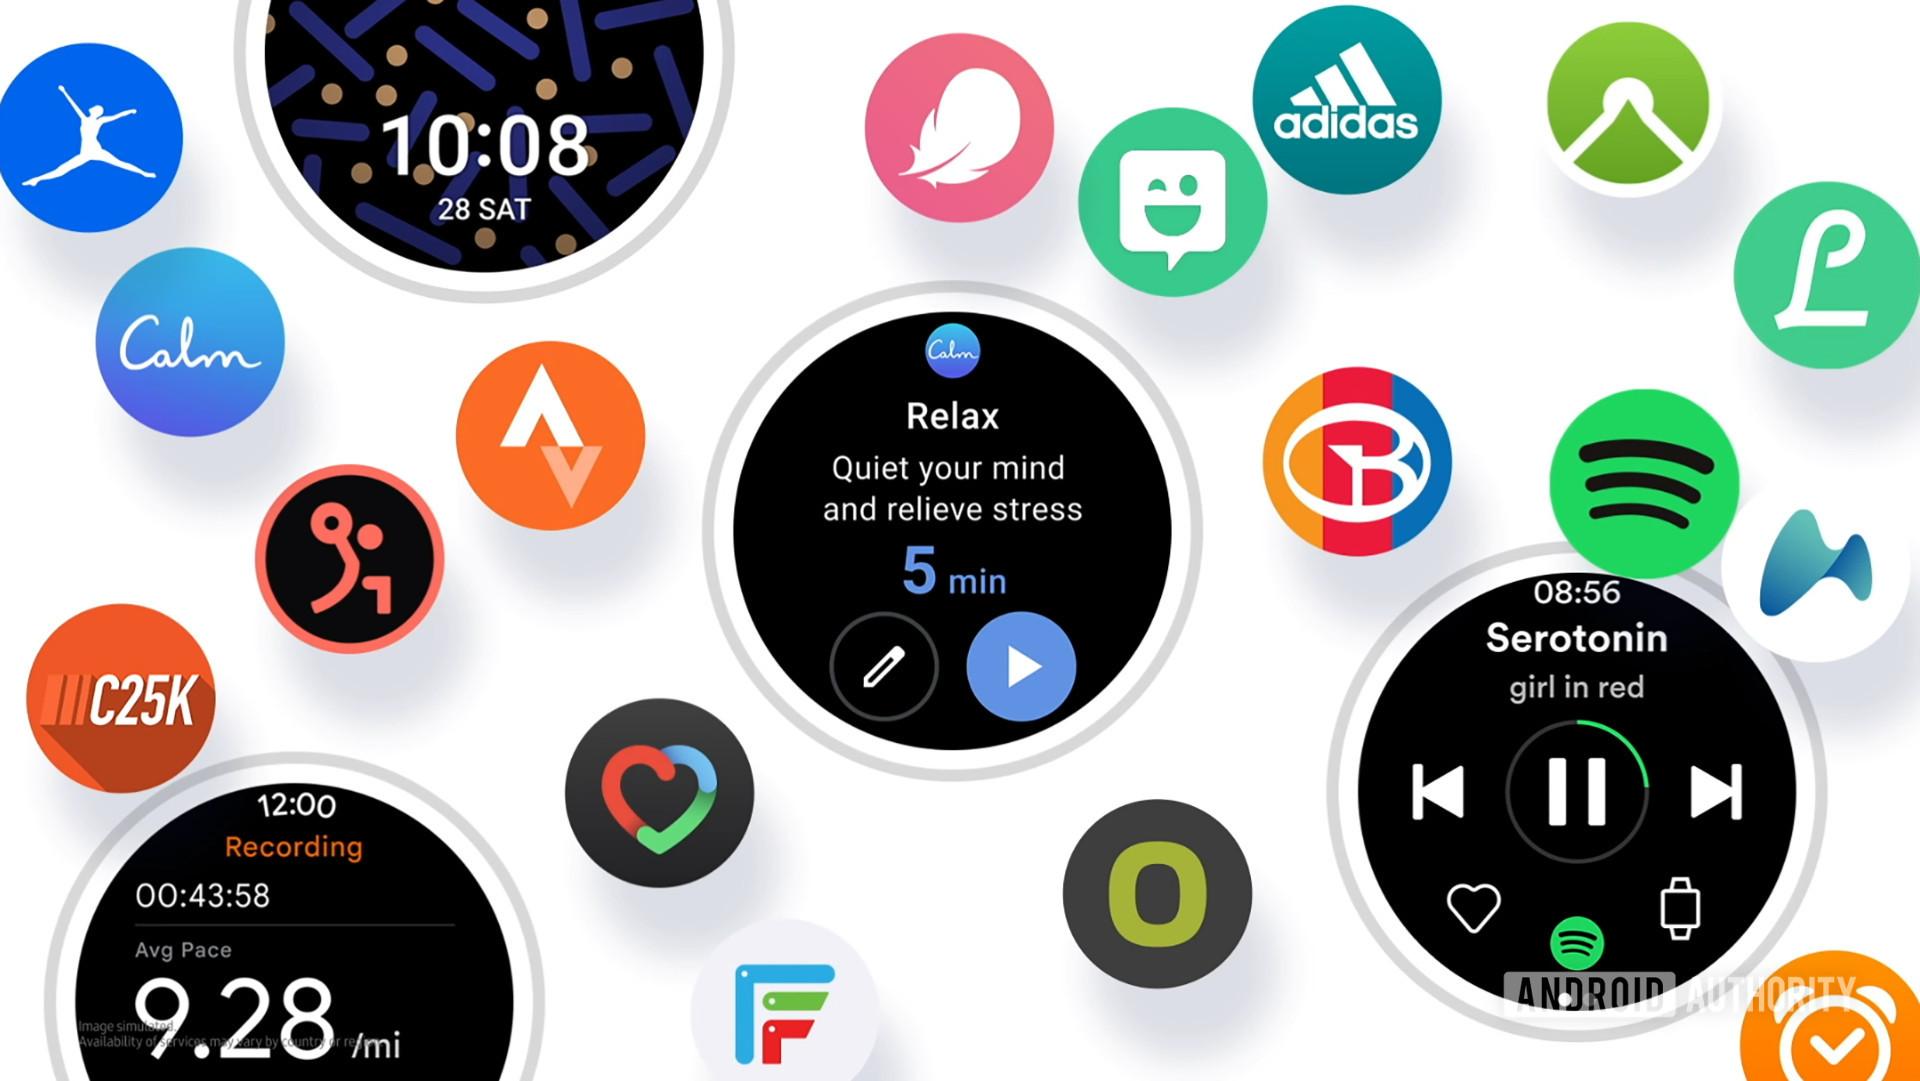 Samsung One UI Watch Hero